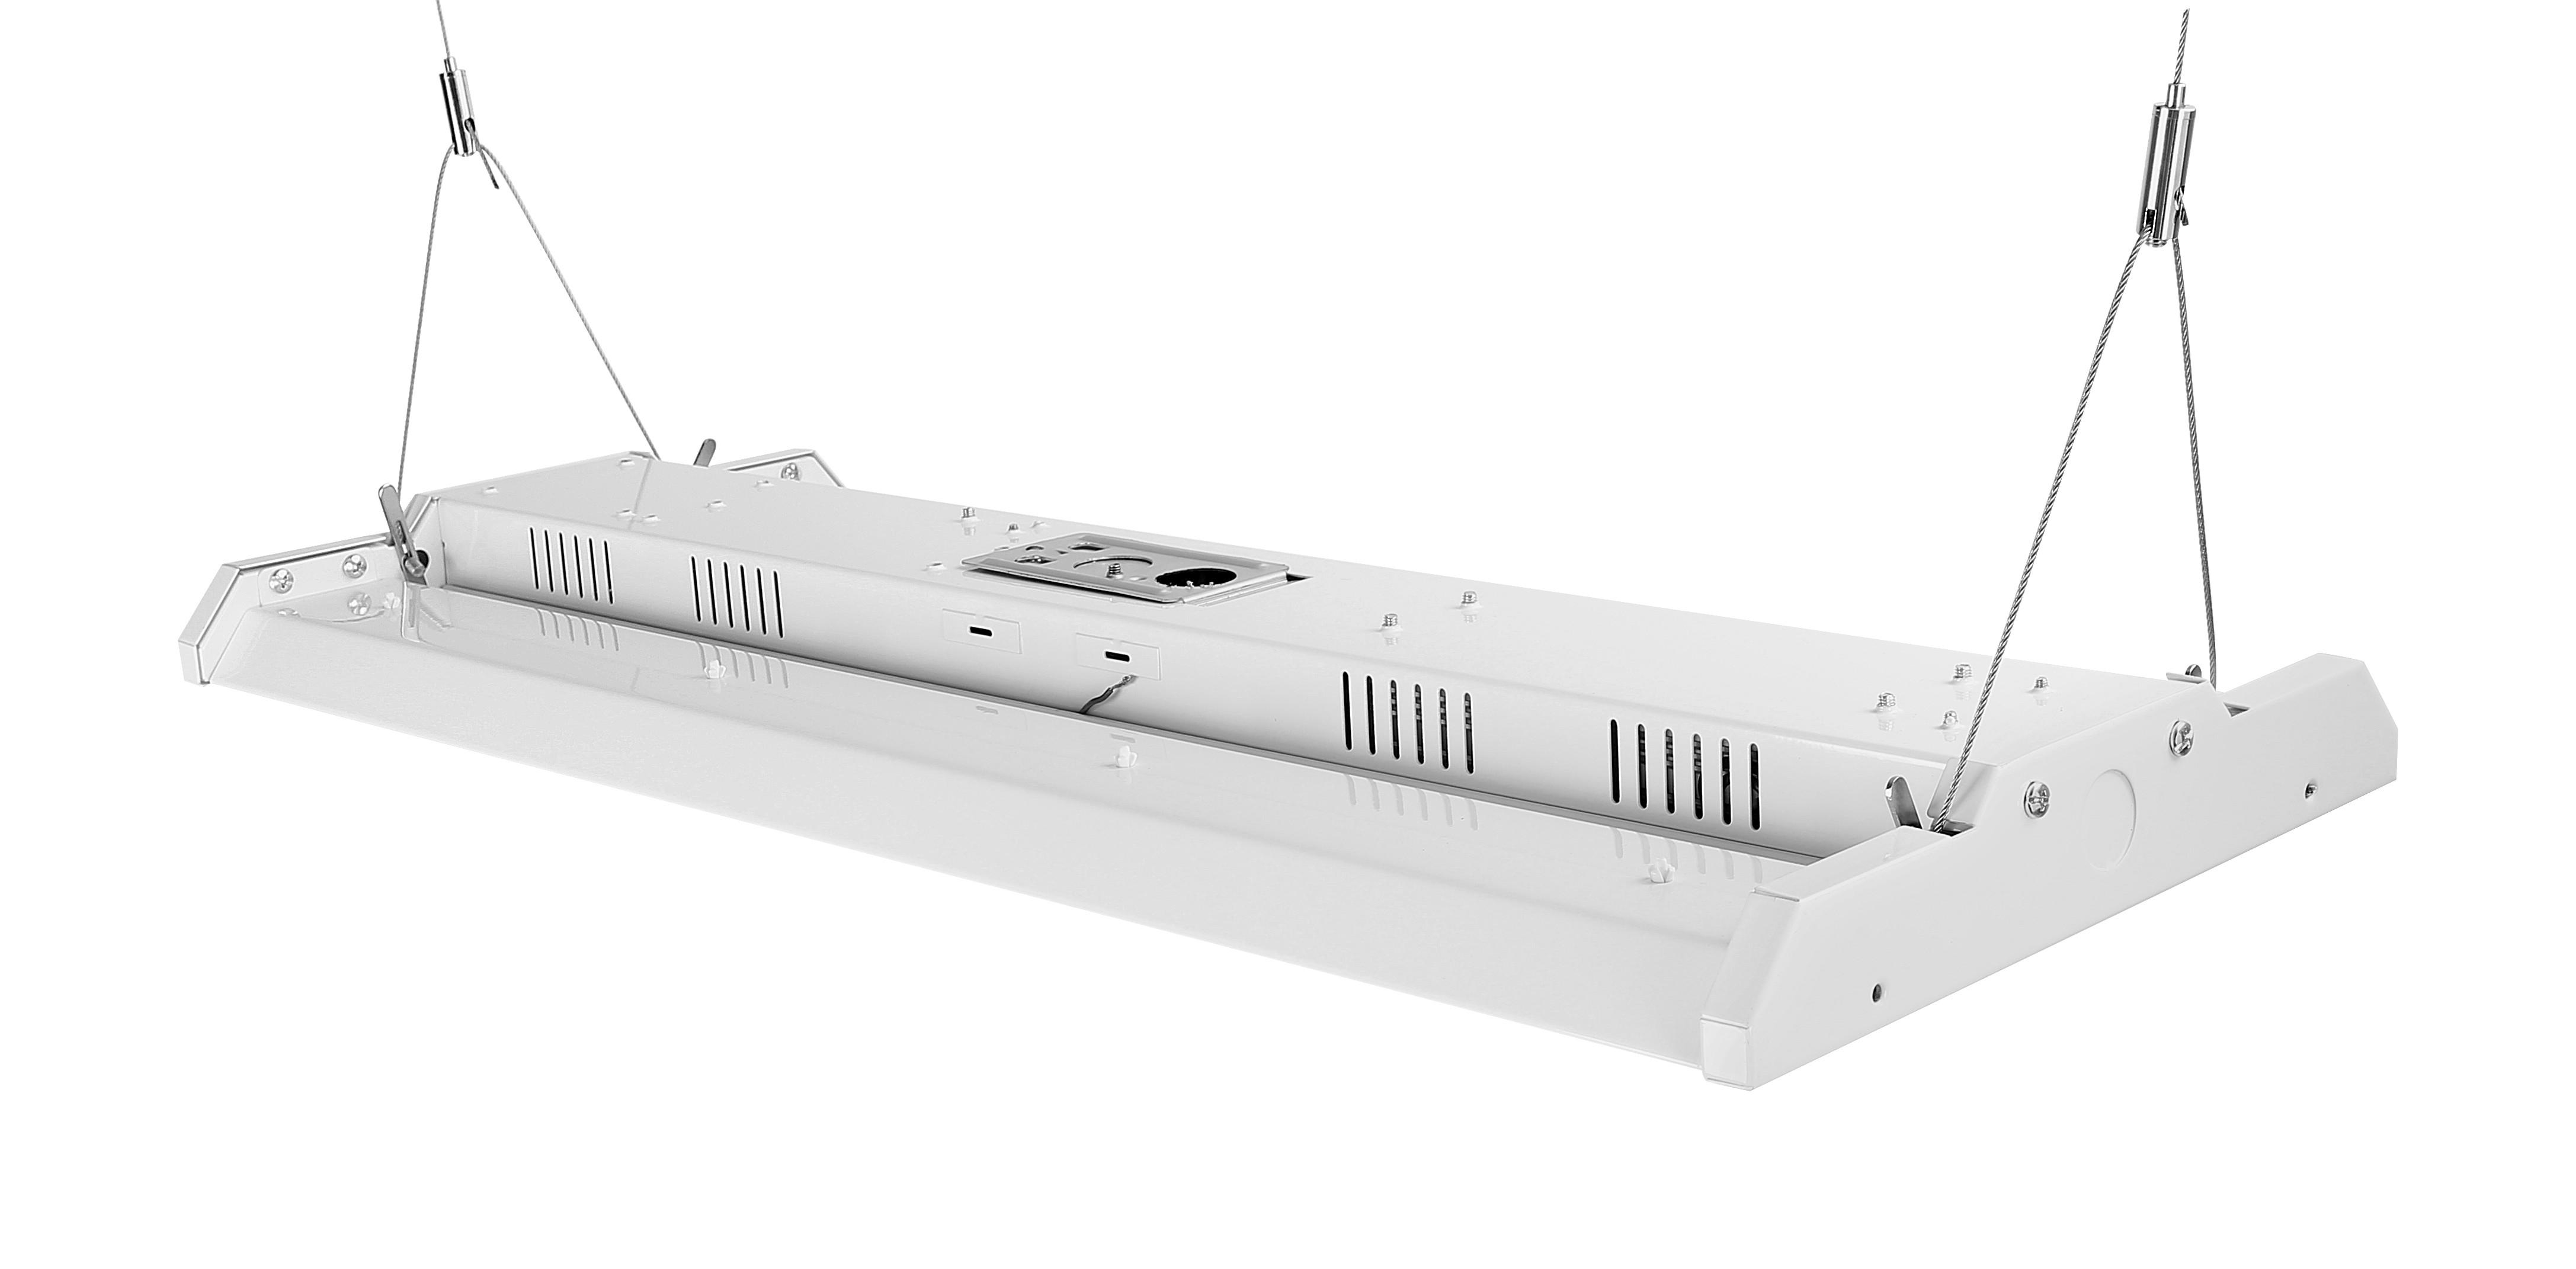 LED Shop Light High Bay, 1' x 2' - 90 Watt, 12,000 Lumens, equivalent to 175W Metal Halide